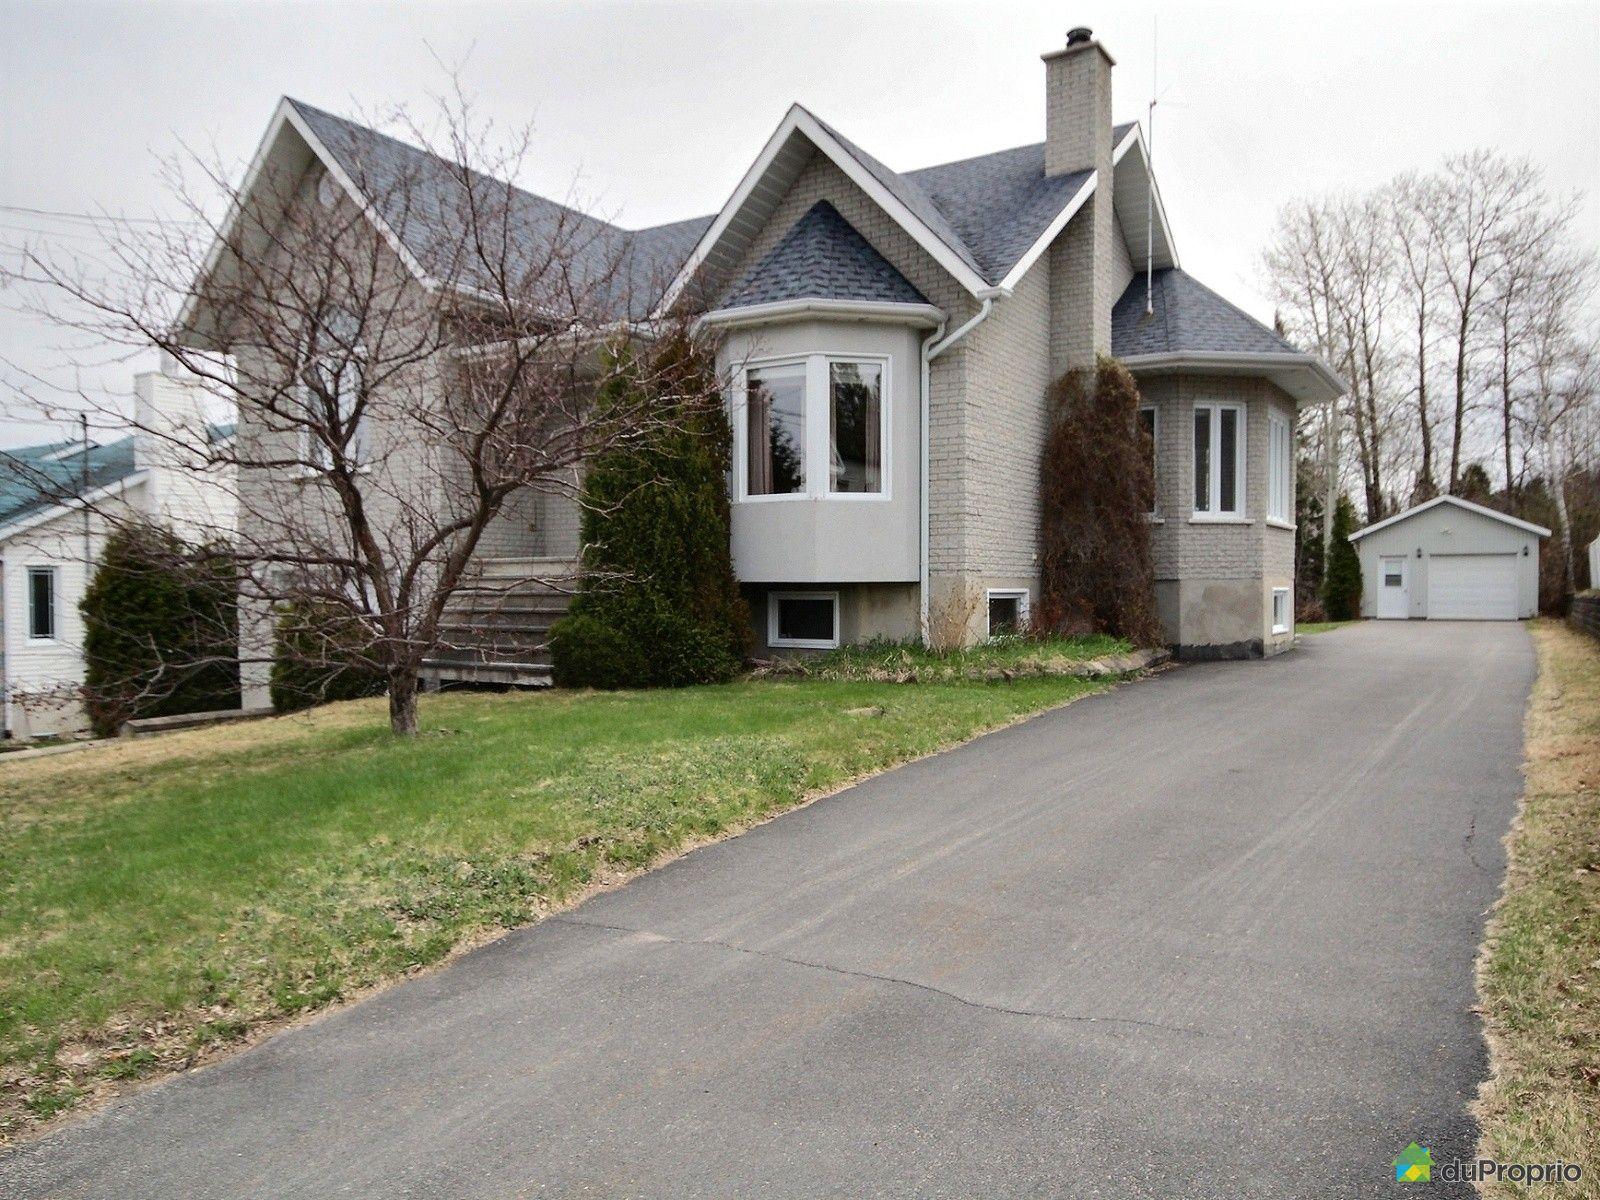 maison 224 vendre alma 591 avenue de grenoble immobilier qu 233 bec duproprio 700907